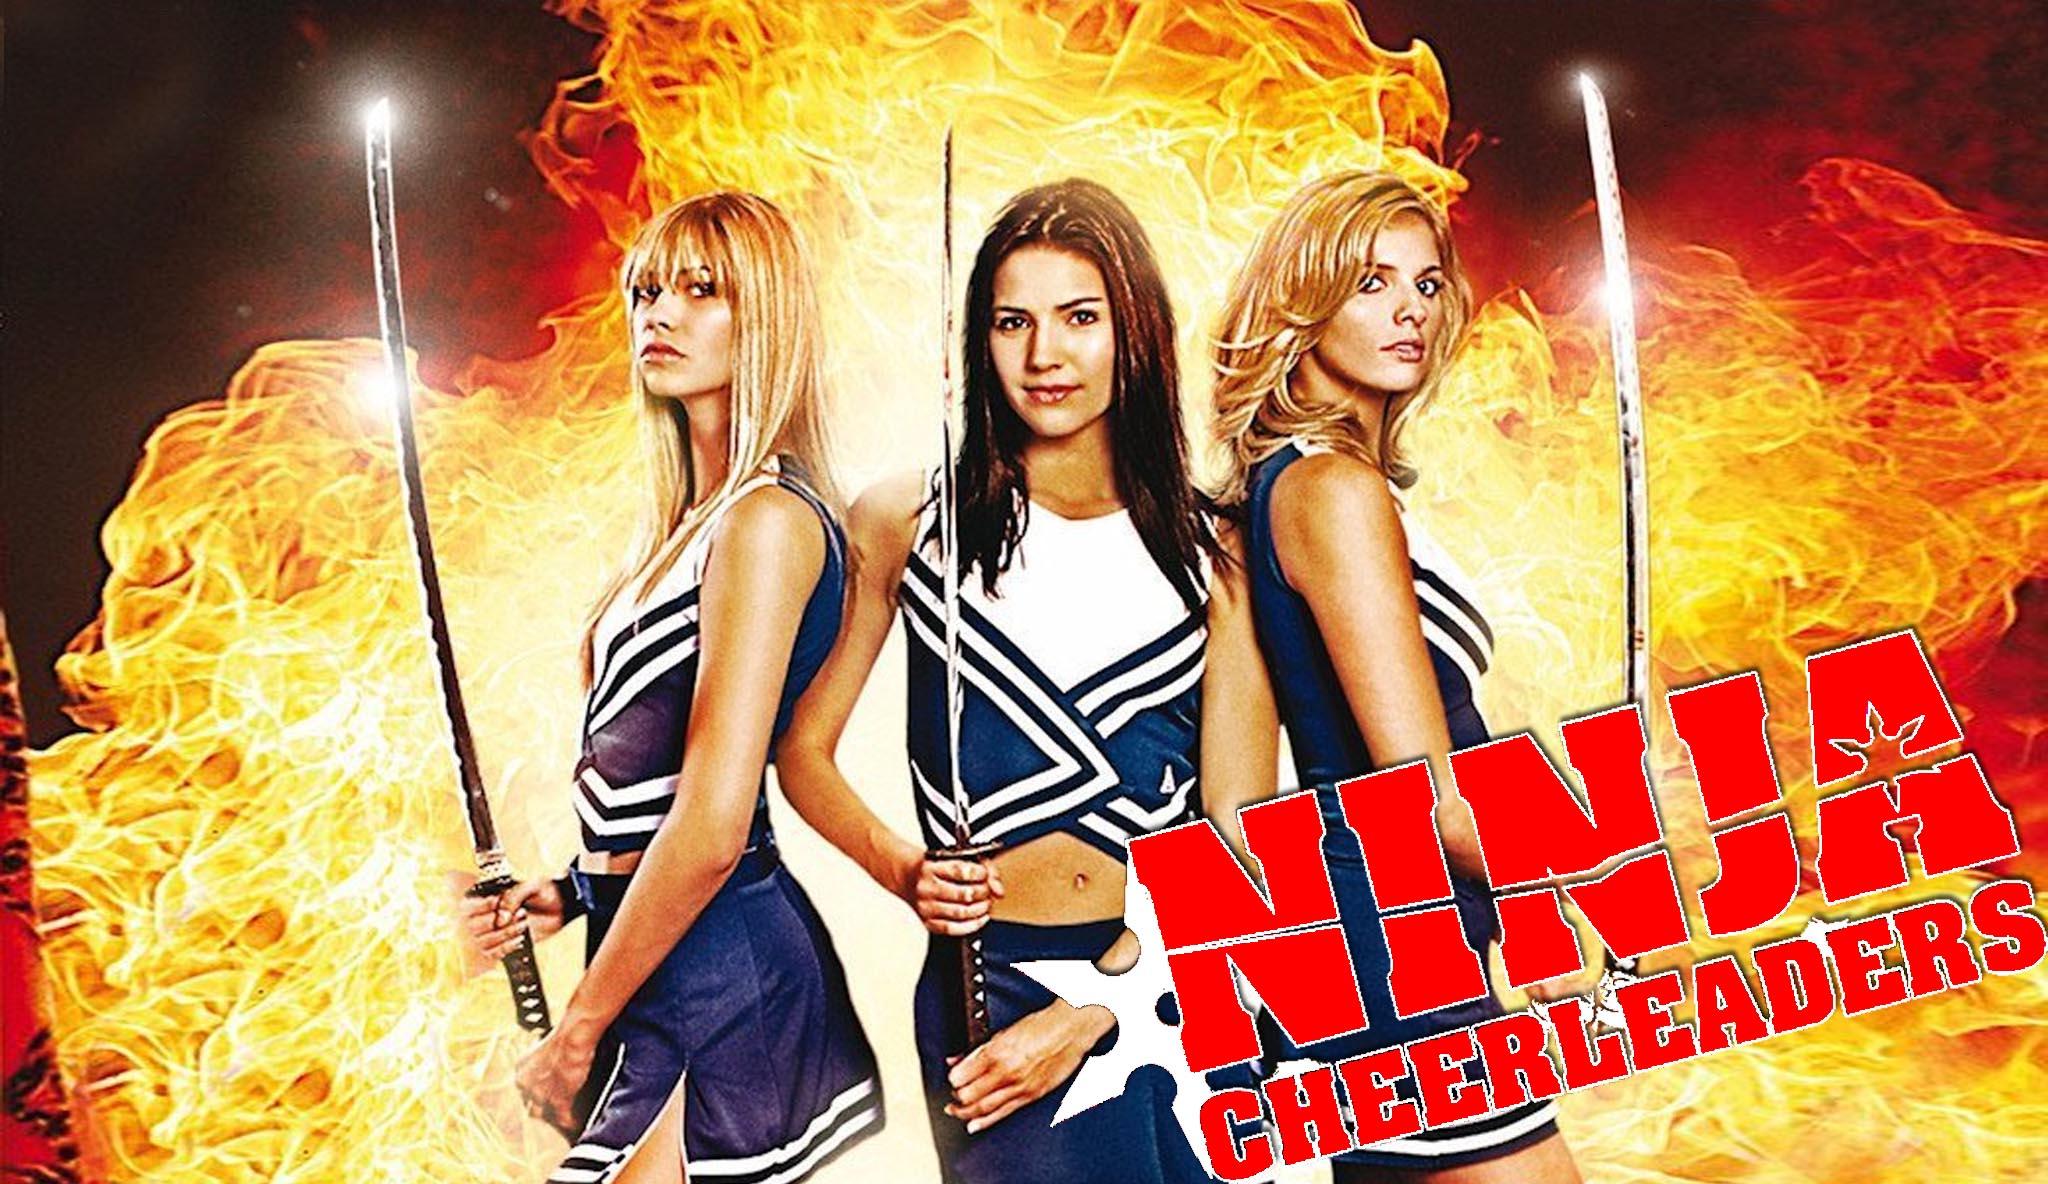 ninja-cheerleaders\header.jpg